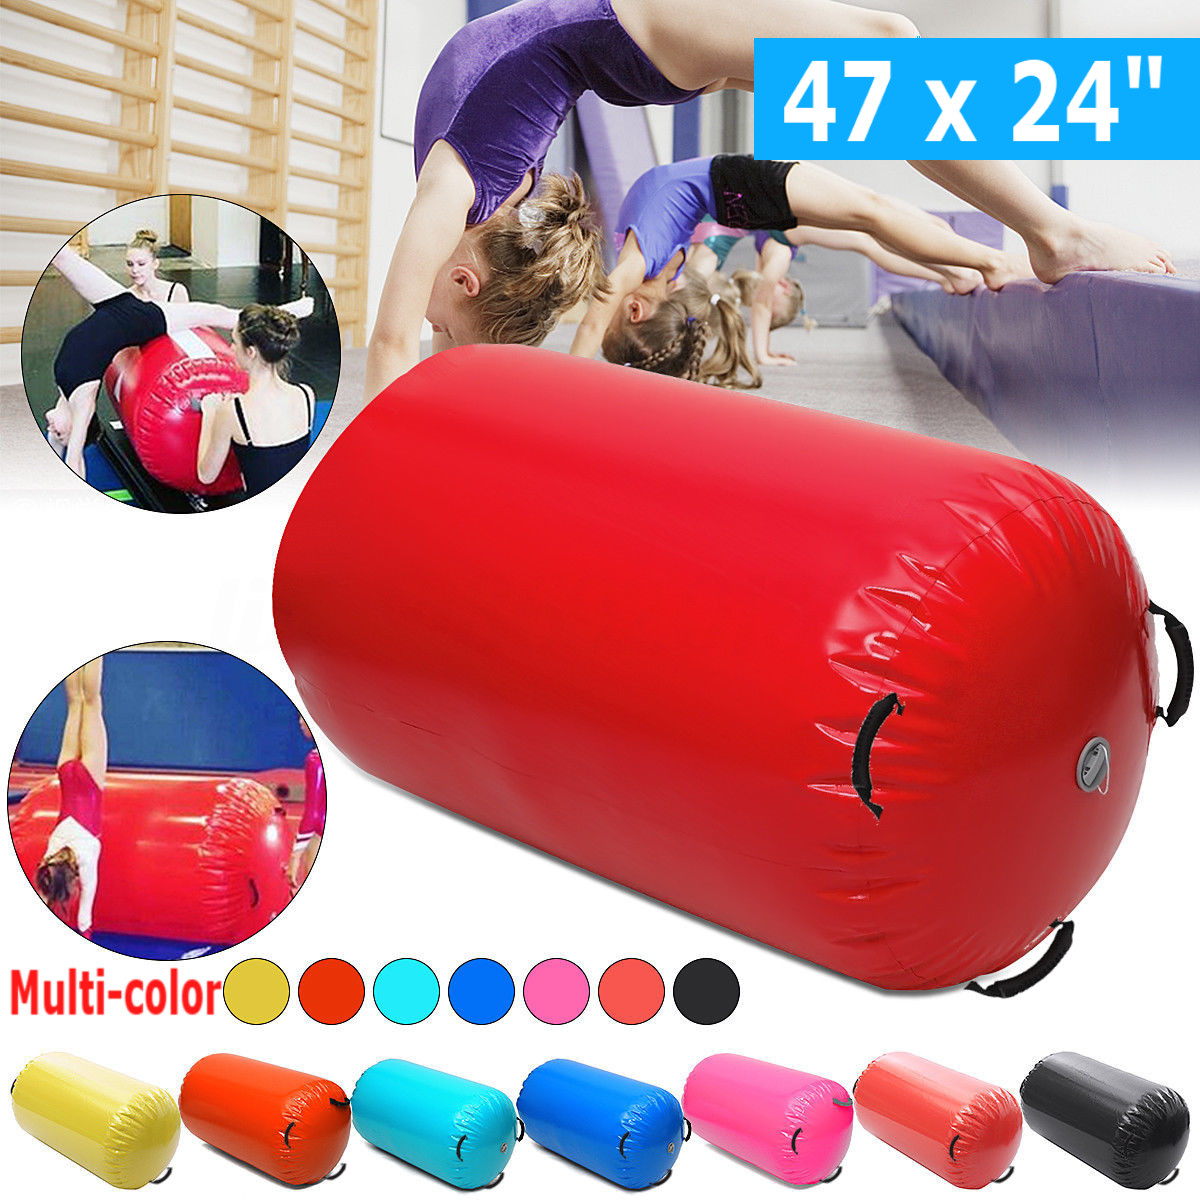 120x60cm Inflatable Gymnastic Air Rolls Beam Yoga Gymnastics Cylinder Airtrack Exercise Column